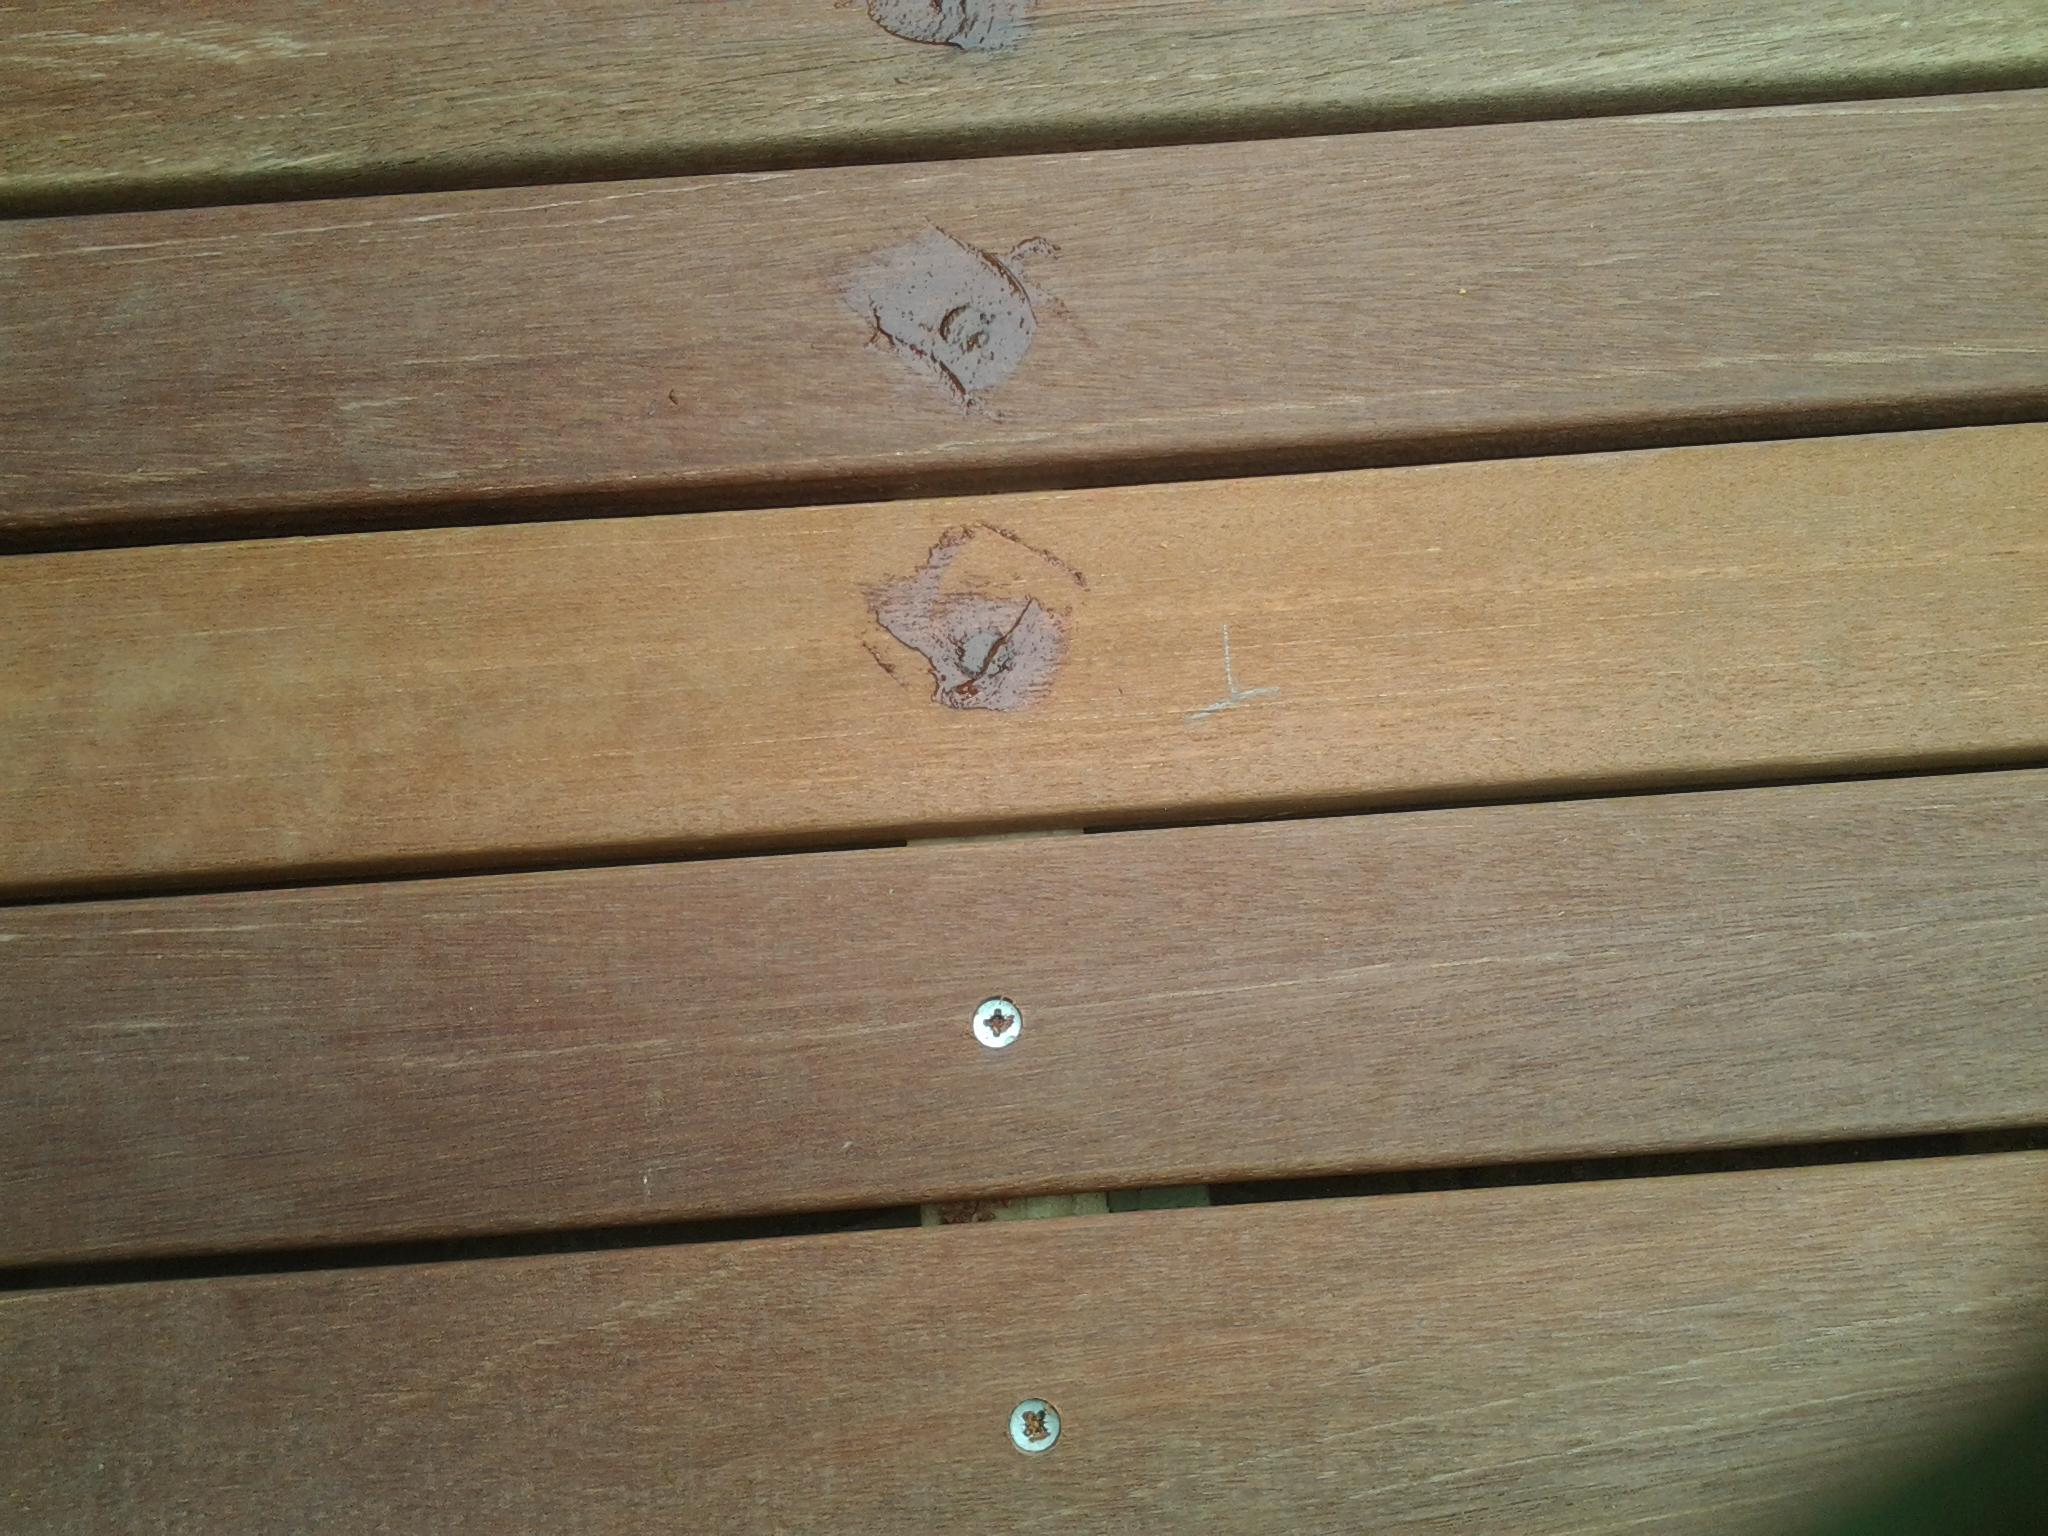 1 Sansome St 40th Floor San Francisco California 94104 One